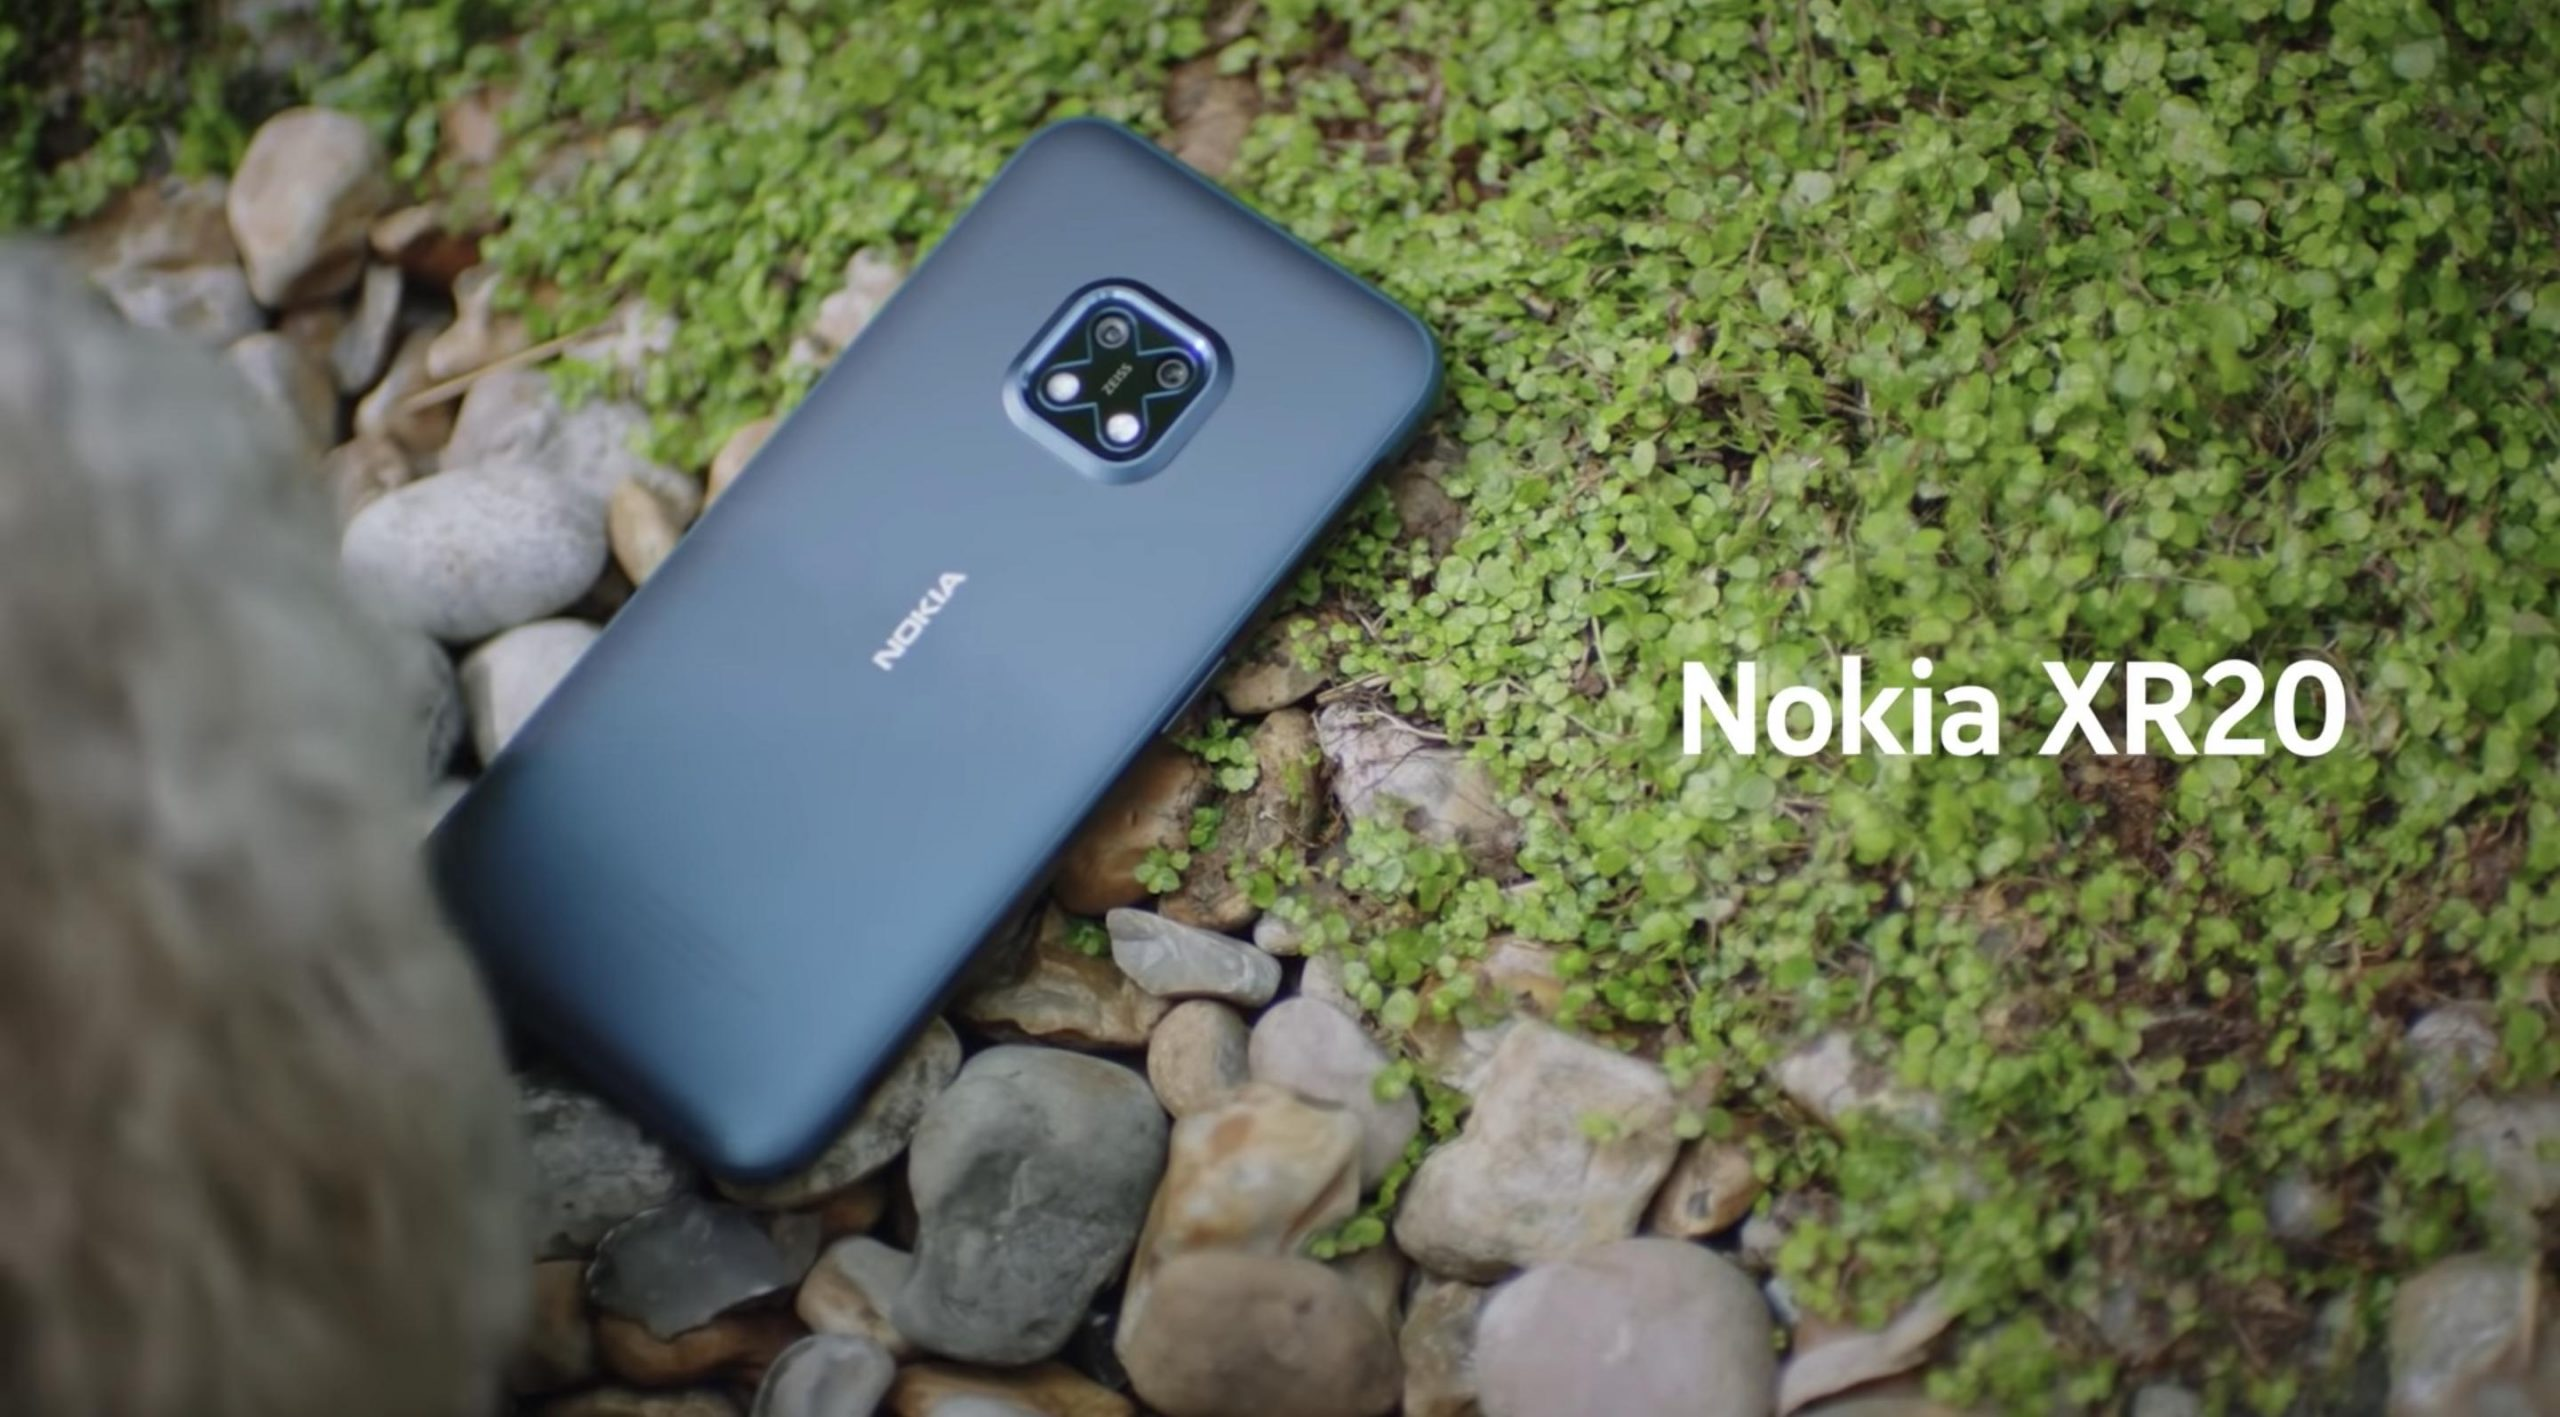 Nokia XR20 สมาร์ทโฟนสายอึดแถมปล่อยออกมาในราคาประหยัดจากNokia